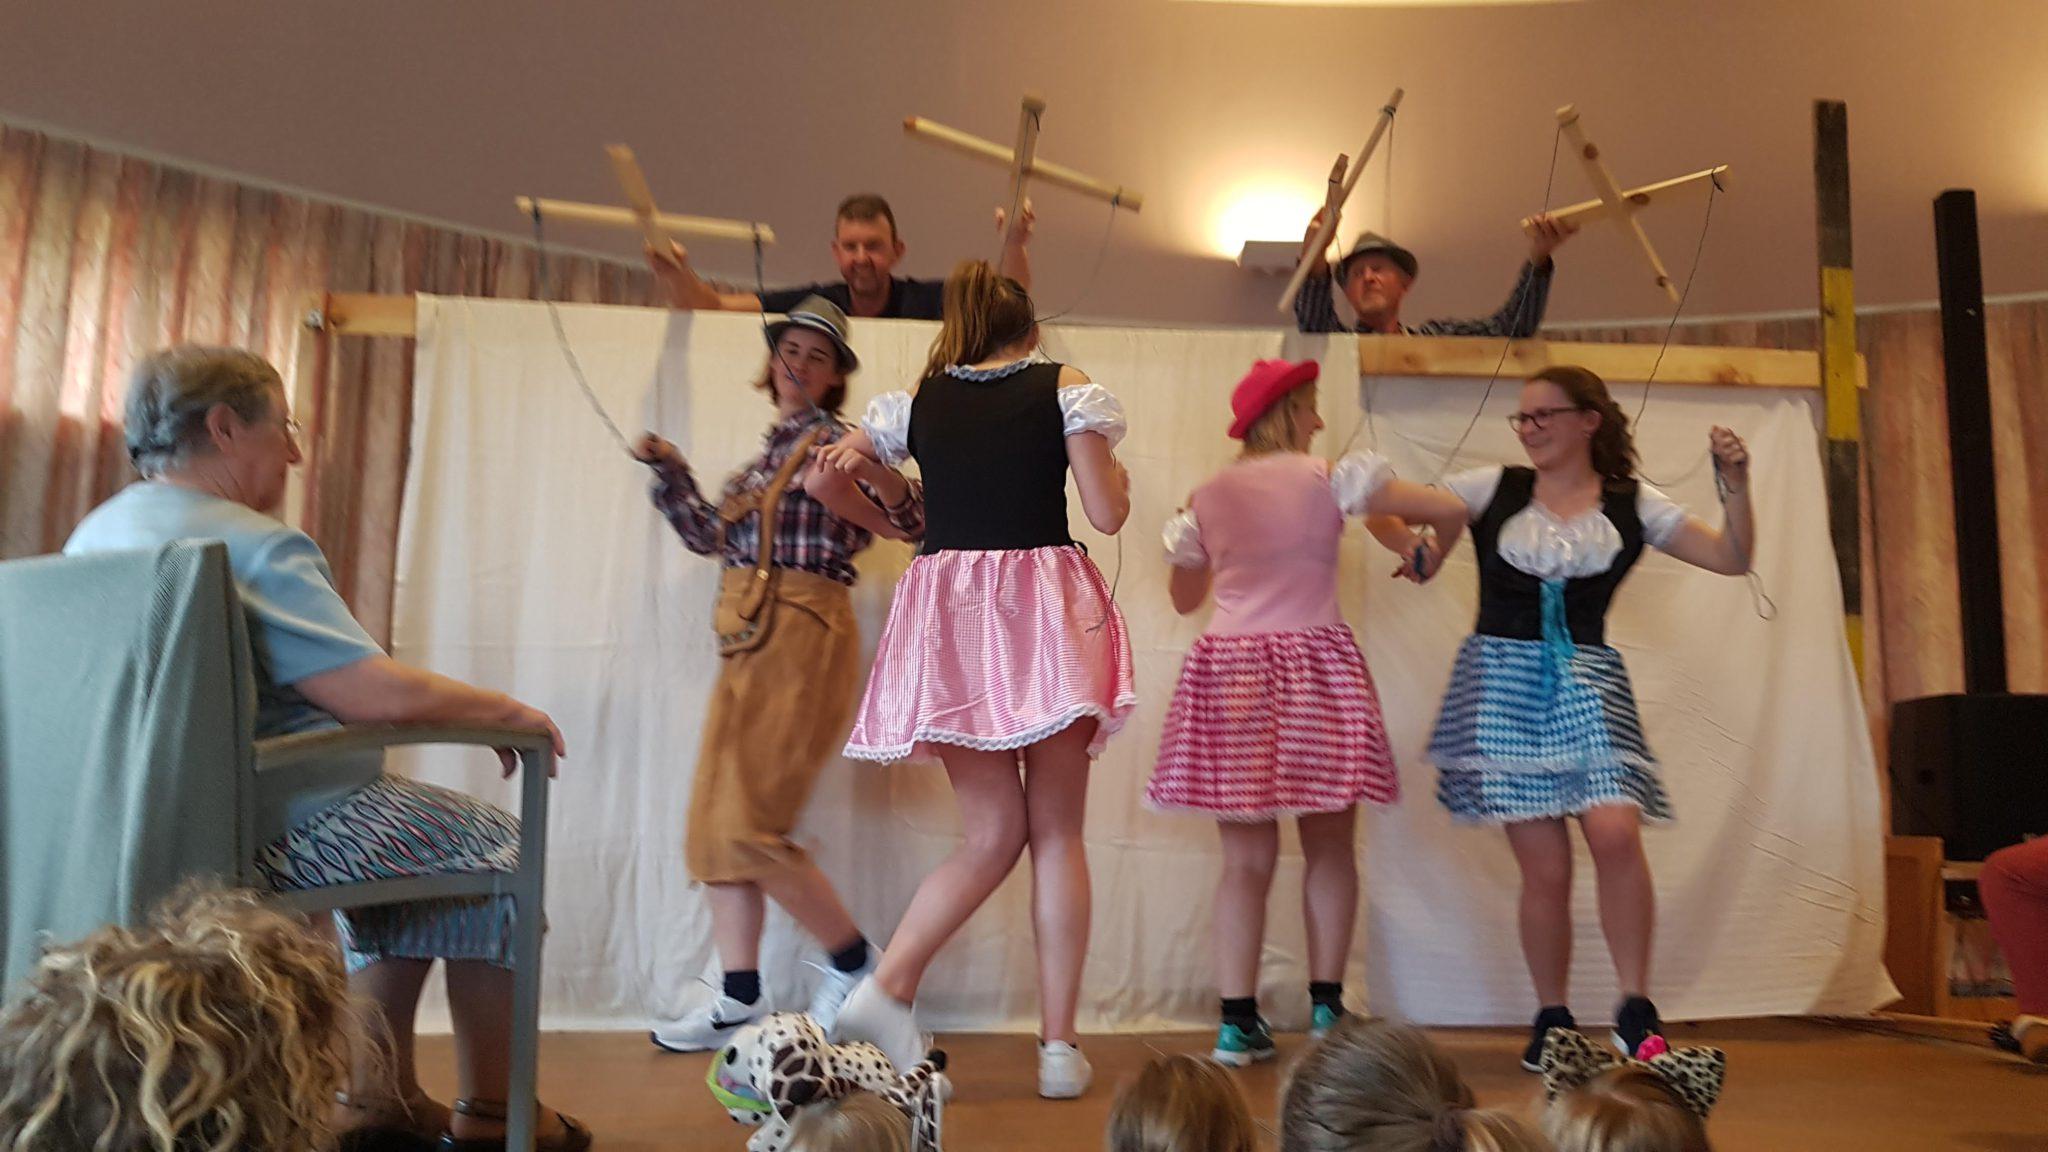 Carnaval in huis